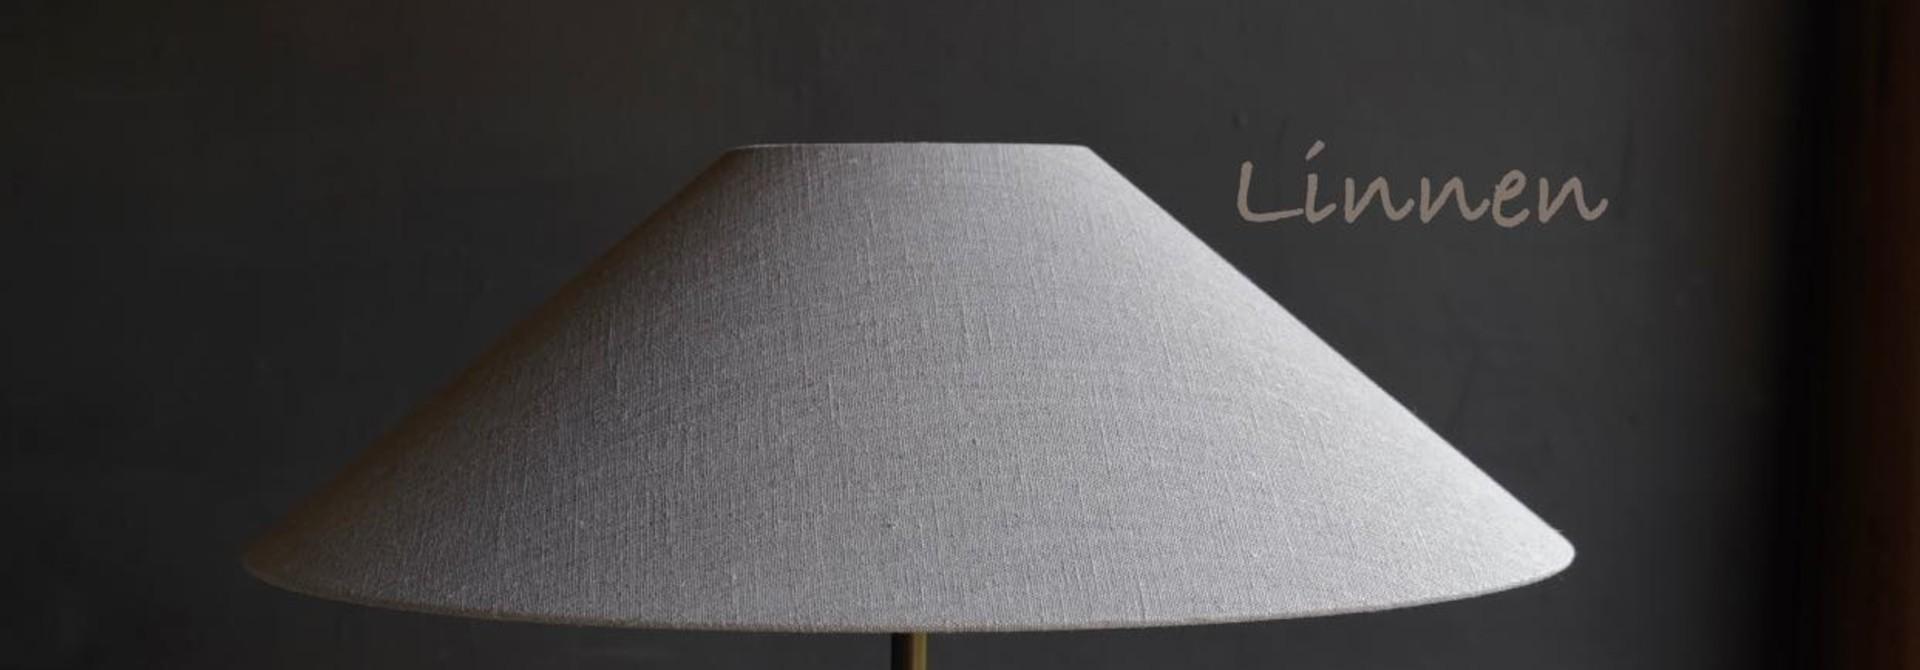 Abgewinkelter Lampenschirm 50x12cm